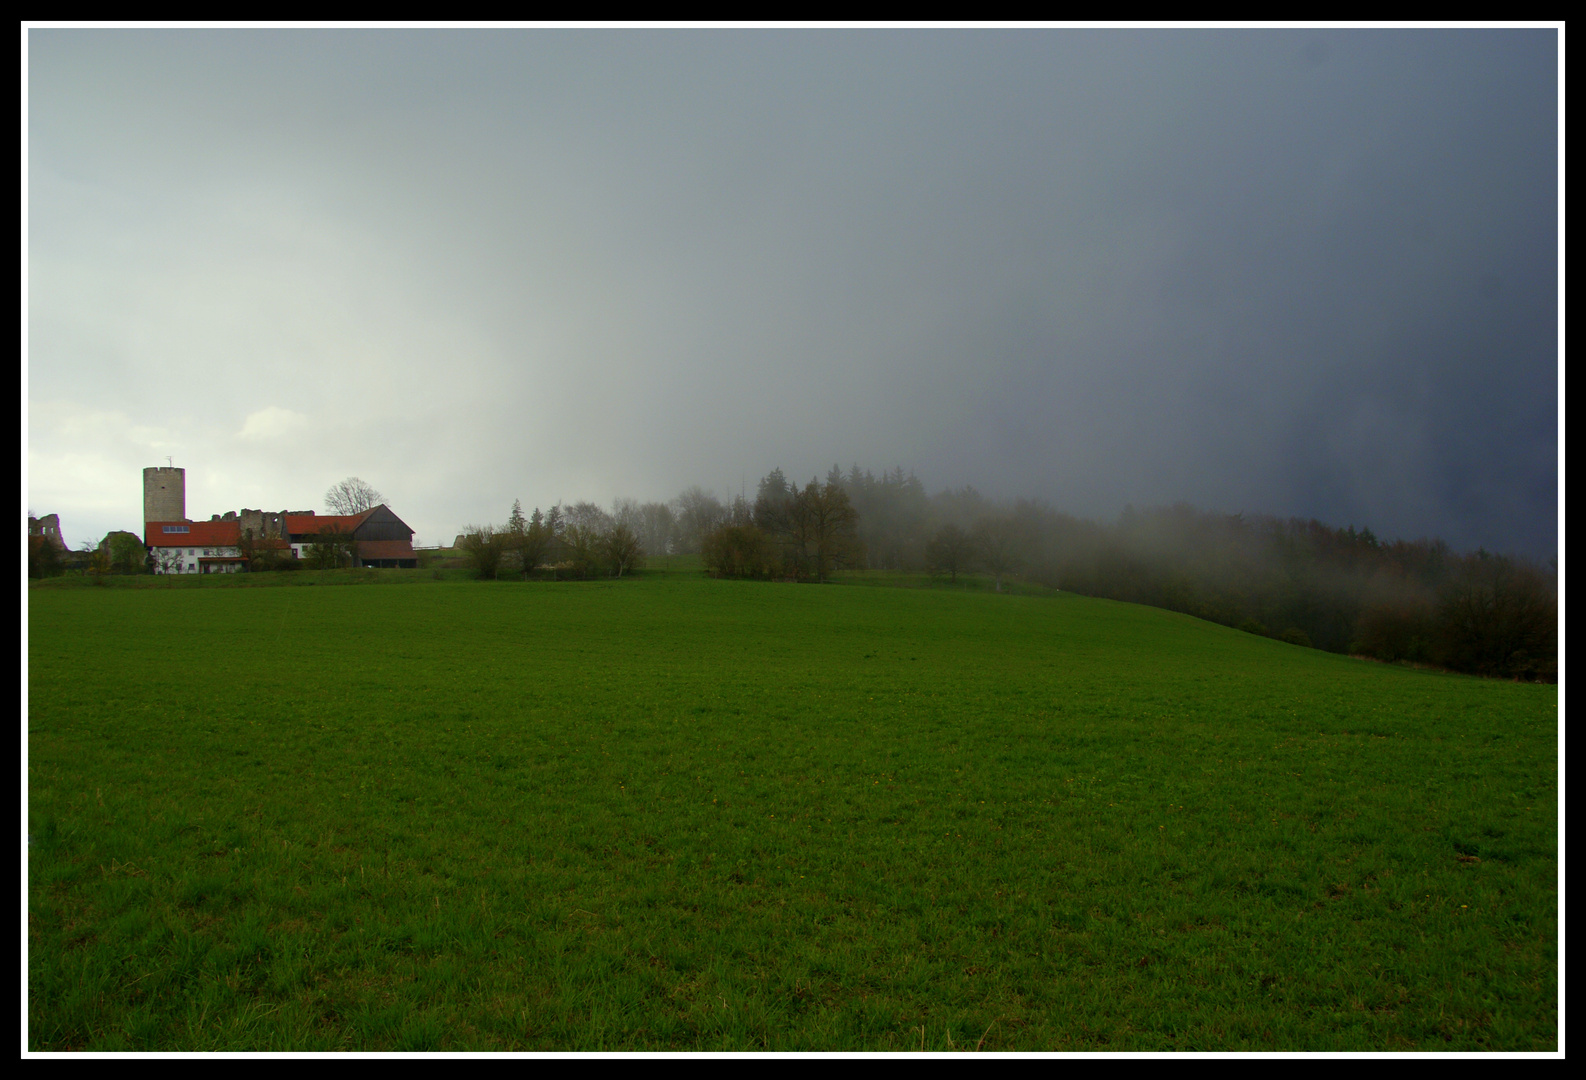 Nach dem Regen...